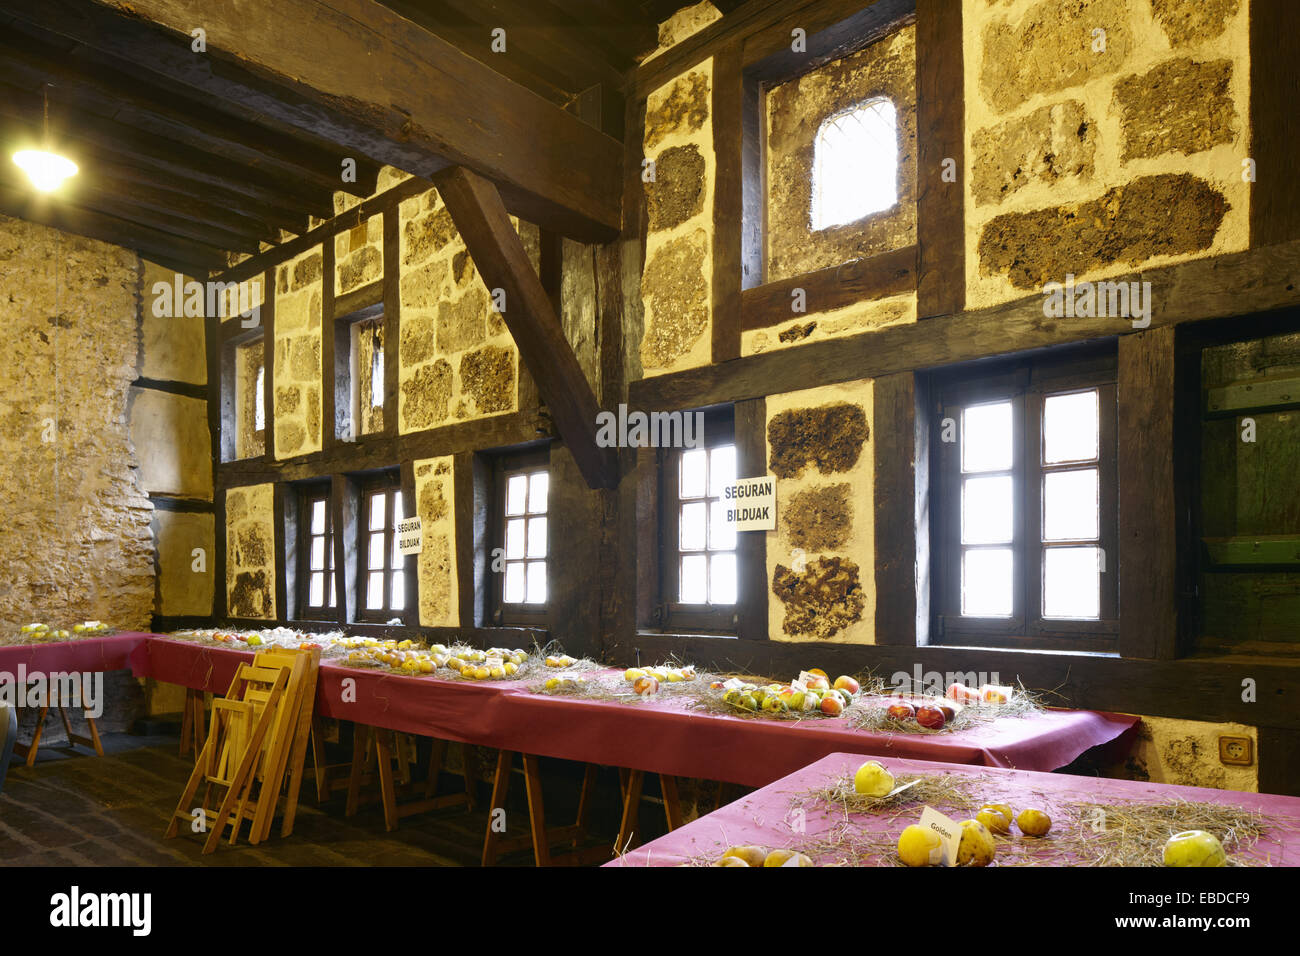 Ardixarra House, Interpretation Center of the Middle Ages, Segura, Goierri, Gipuzkoa, Basque Country, Spain - Stock Image